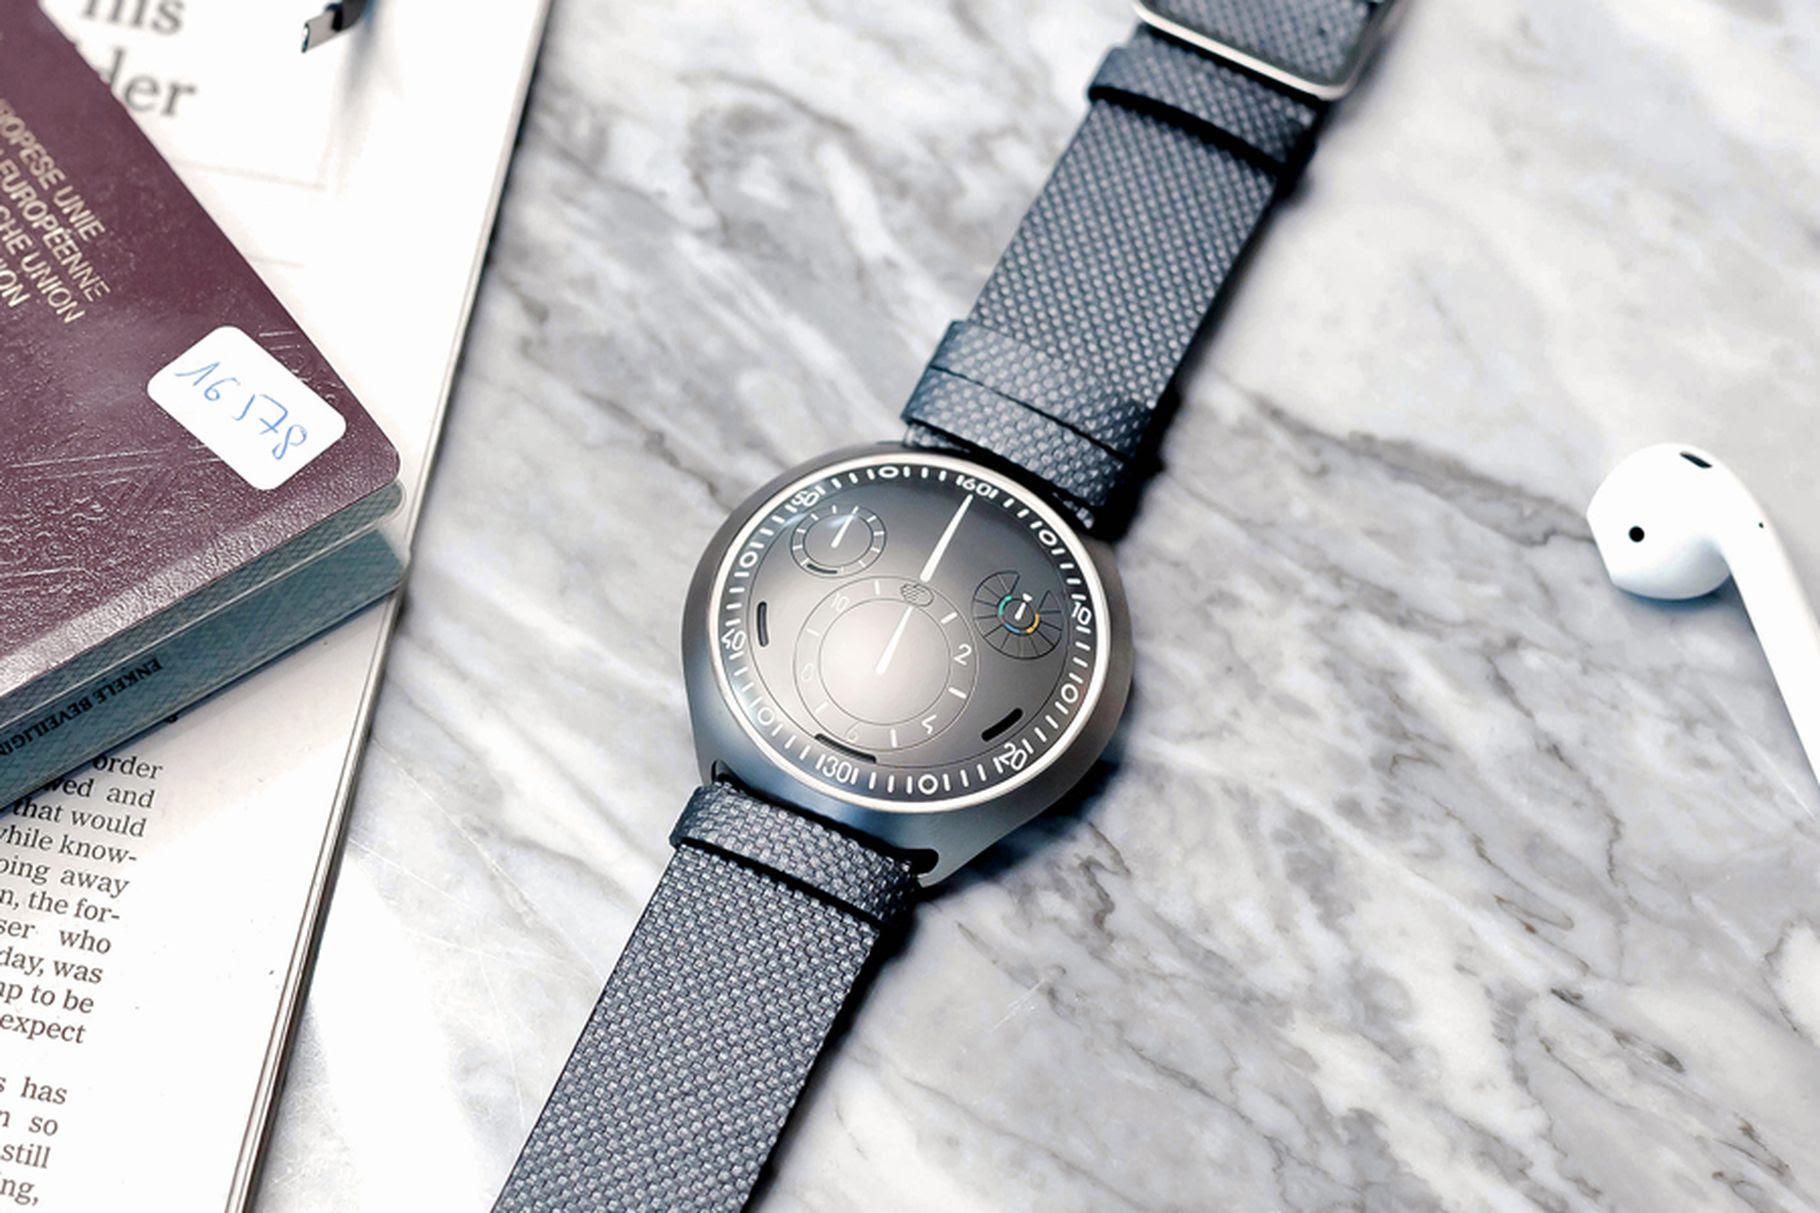 Ressence เปิดตัว Type 2 e-Crown คอนเซปต์นาฬิกาออโตเมติกตั้งเวลาอัตโนมัติผ่านแอพ